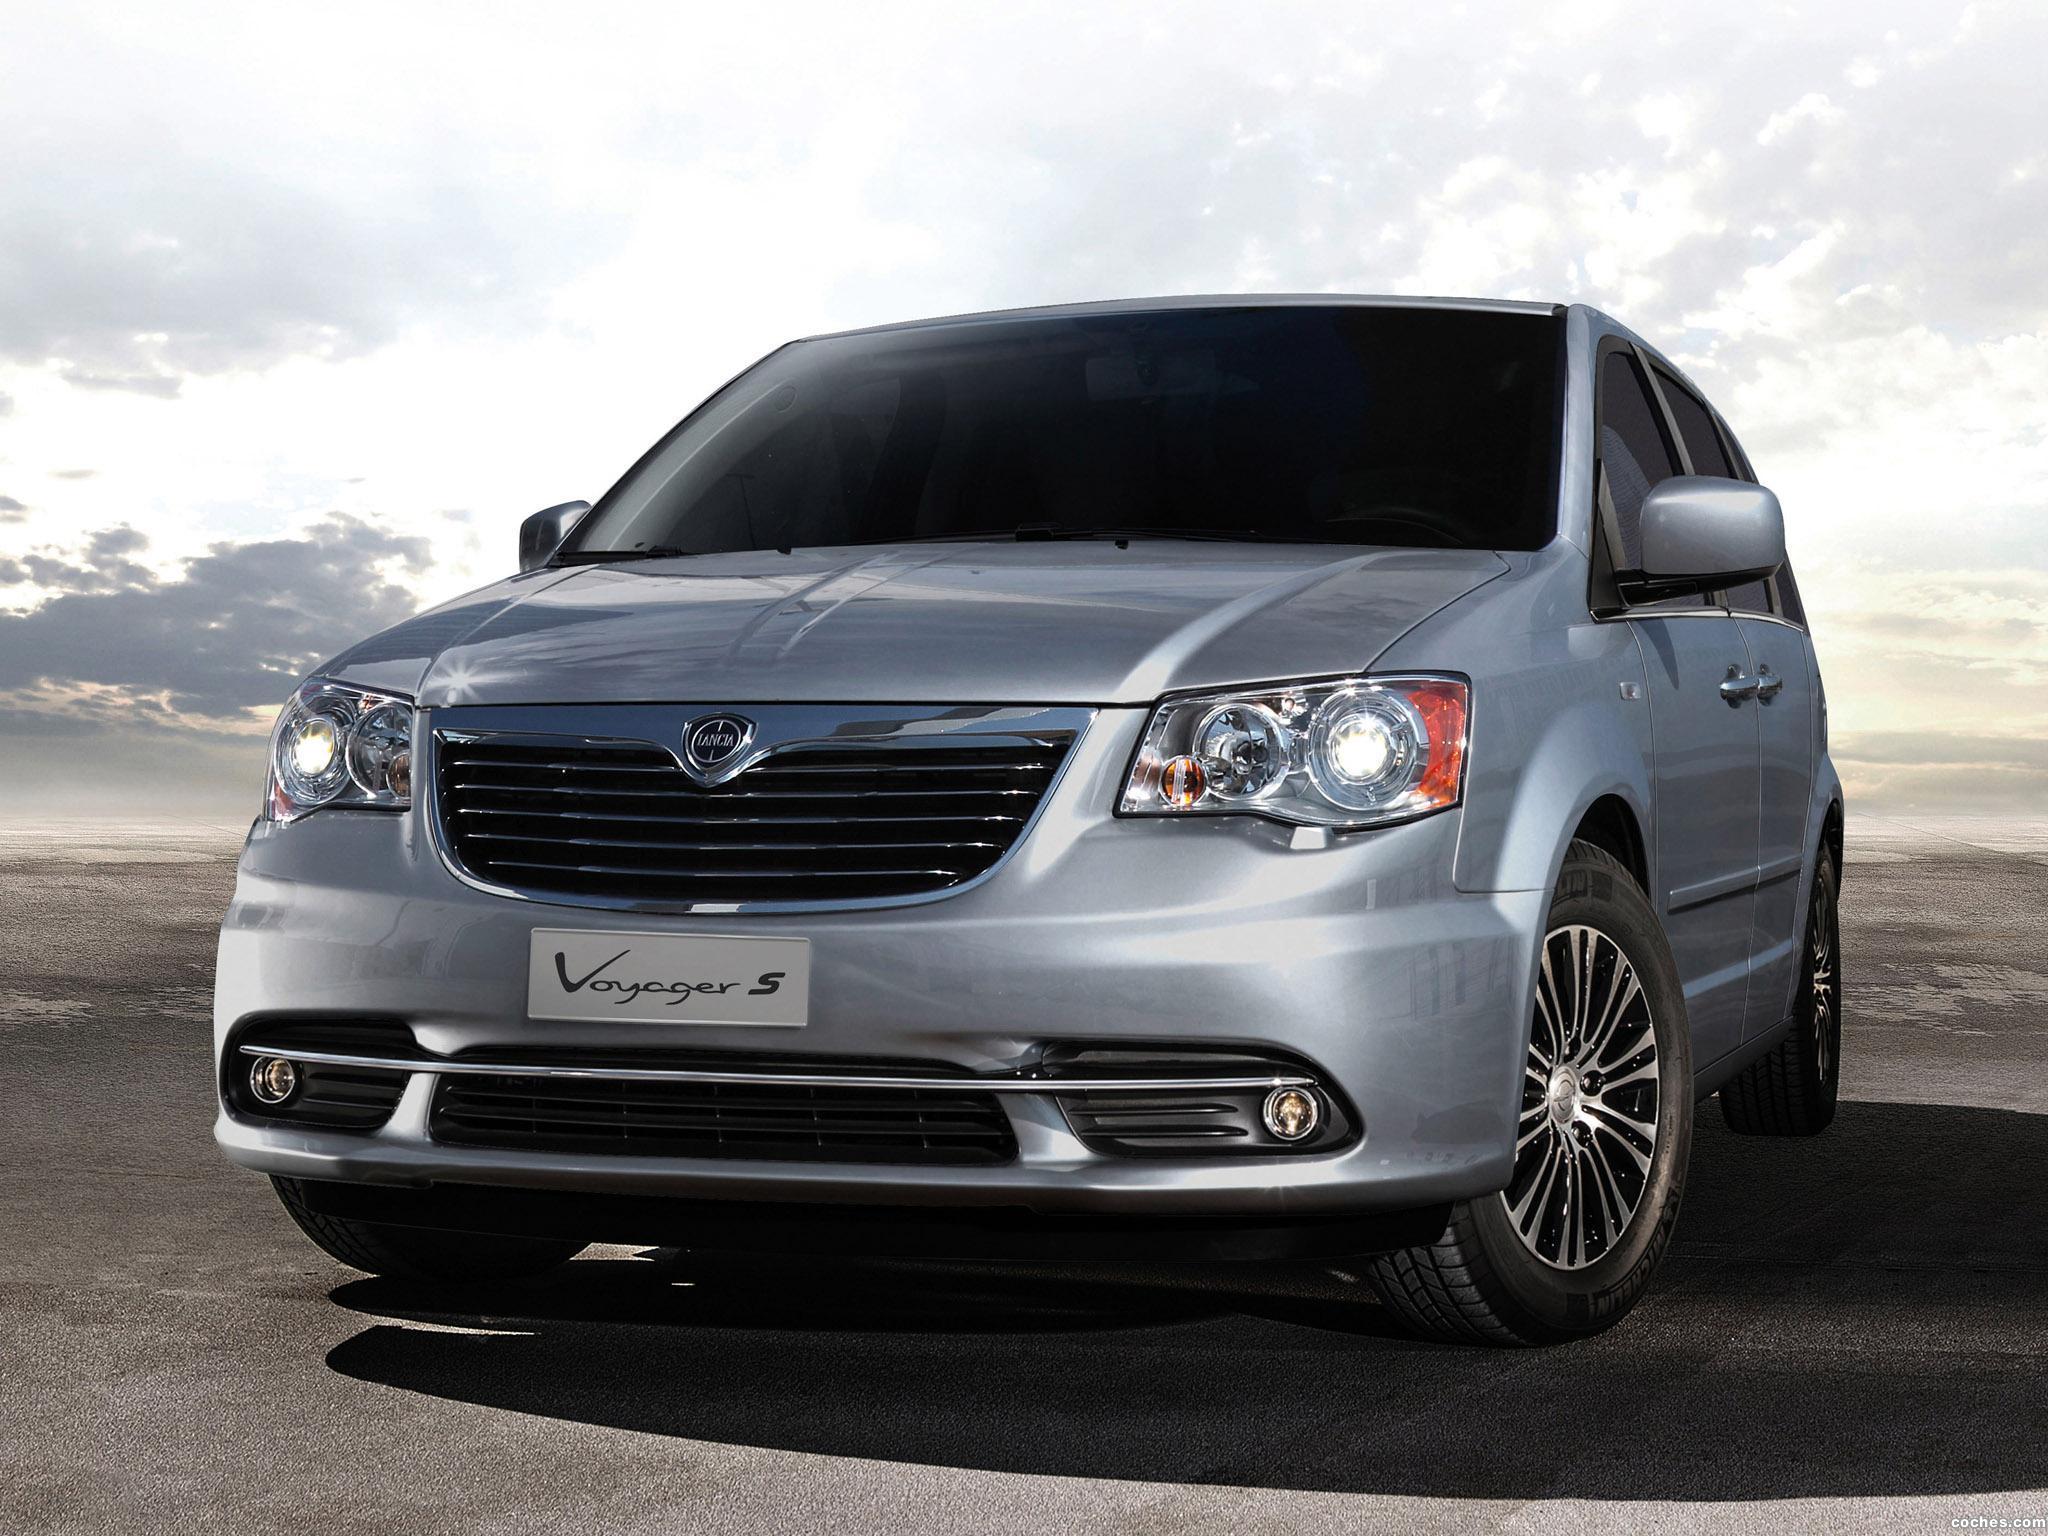 Foto 0 de Lancia Voyager S 2013